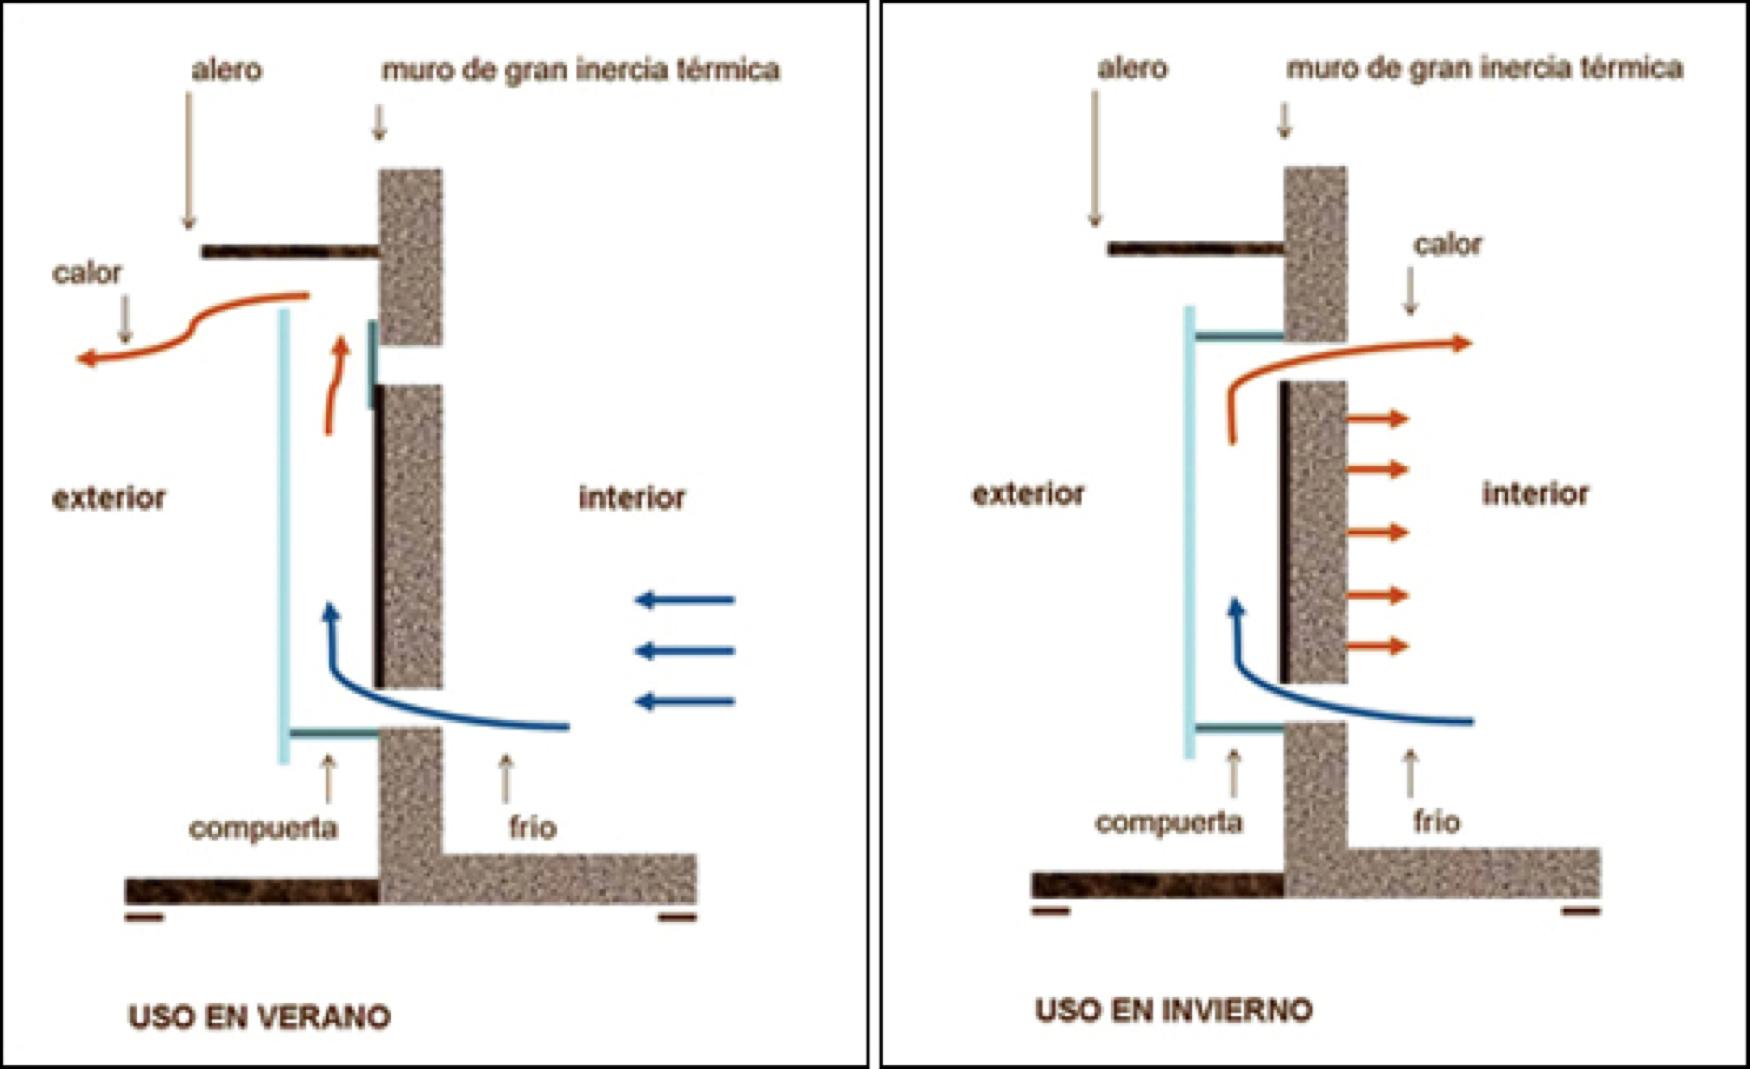 Captaci n solar pedro j hern ndez - Arquitectura bioclimatica ejemplos ...